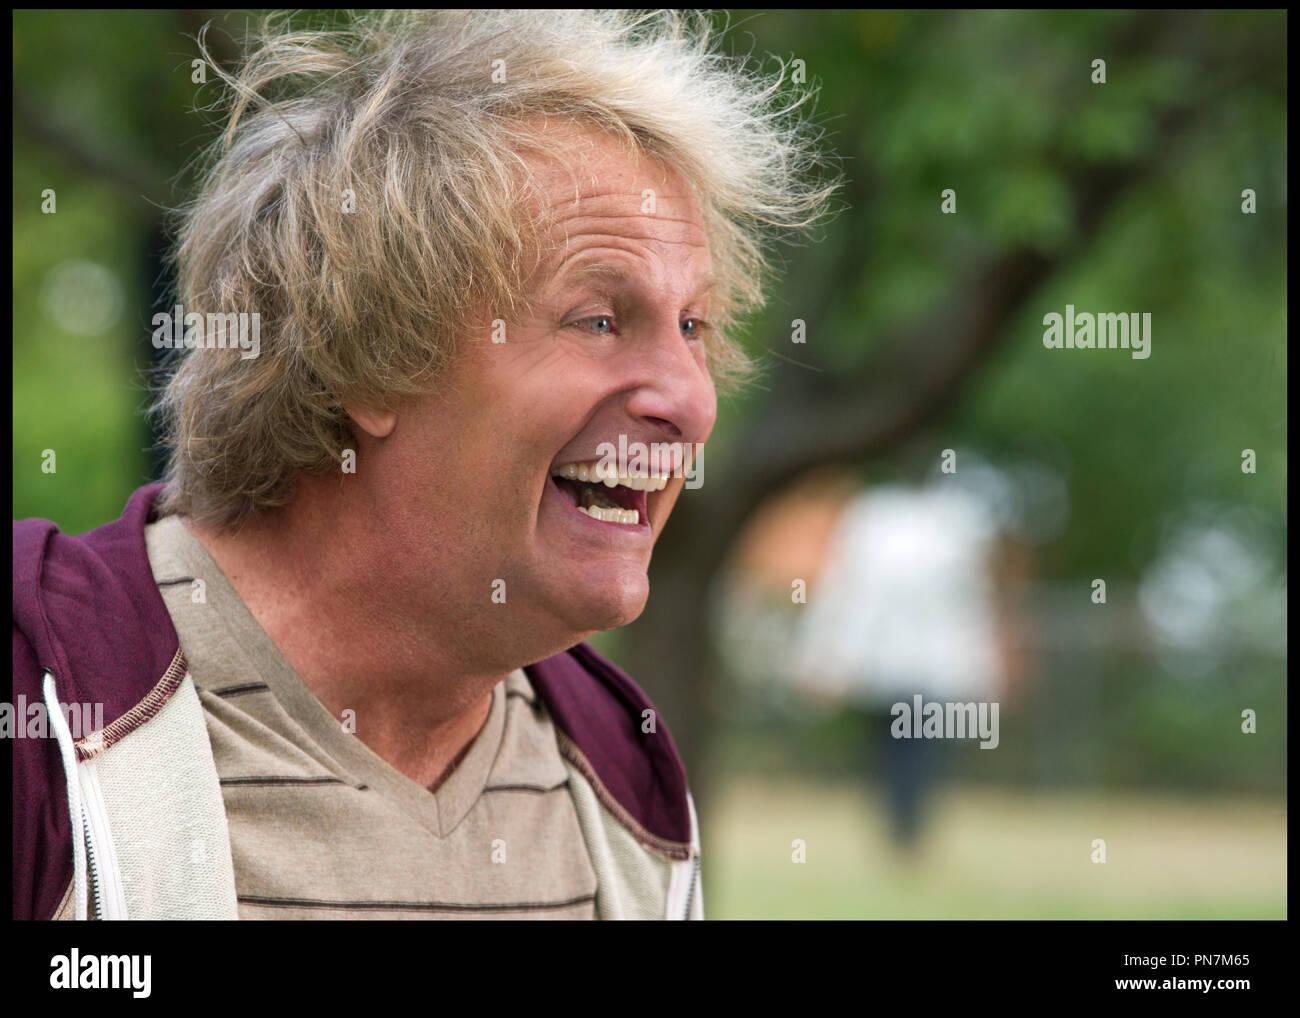 Cretin Stock Photos & Cretin Stock Images - Alamy